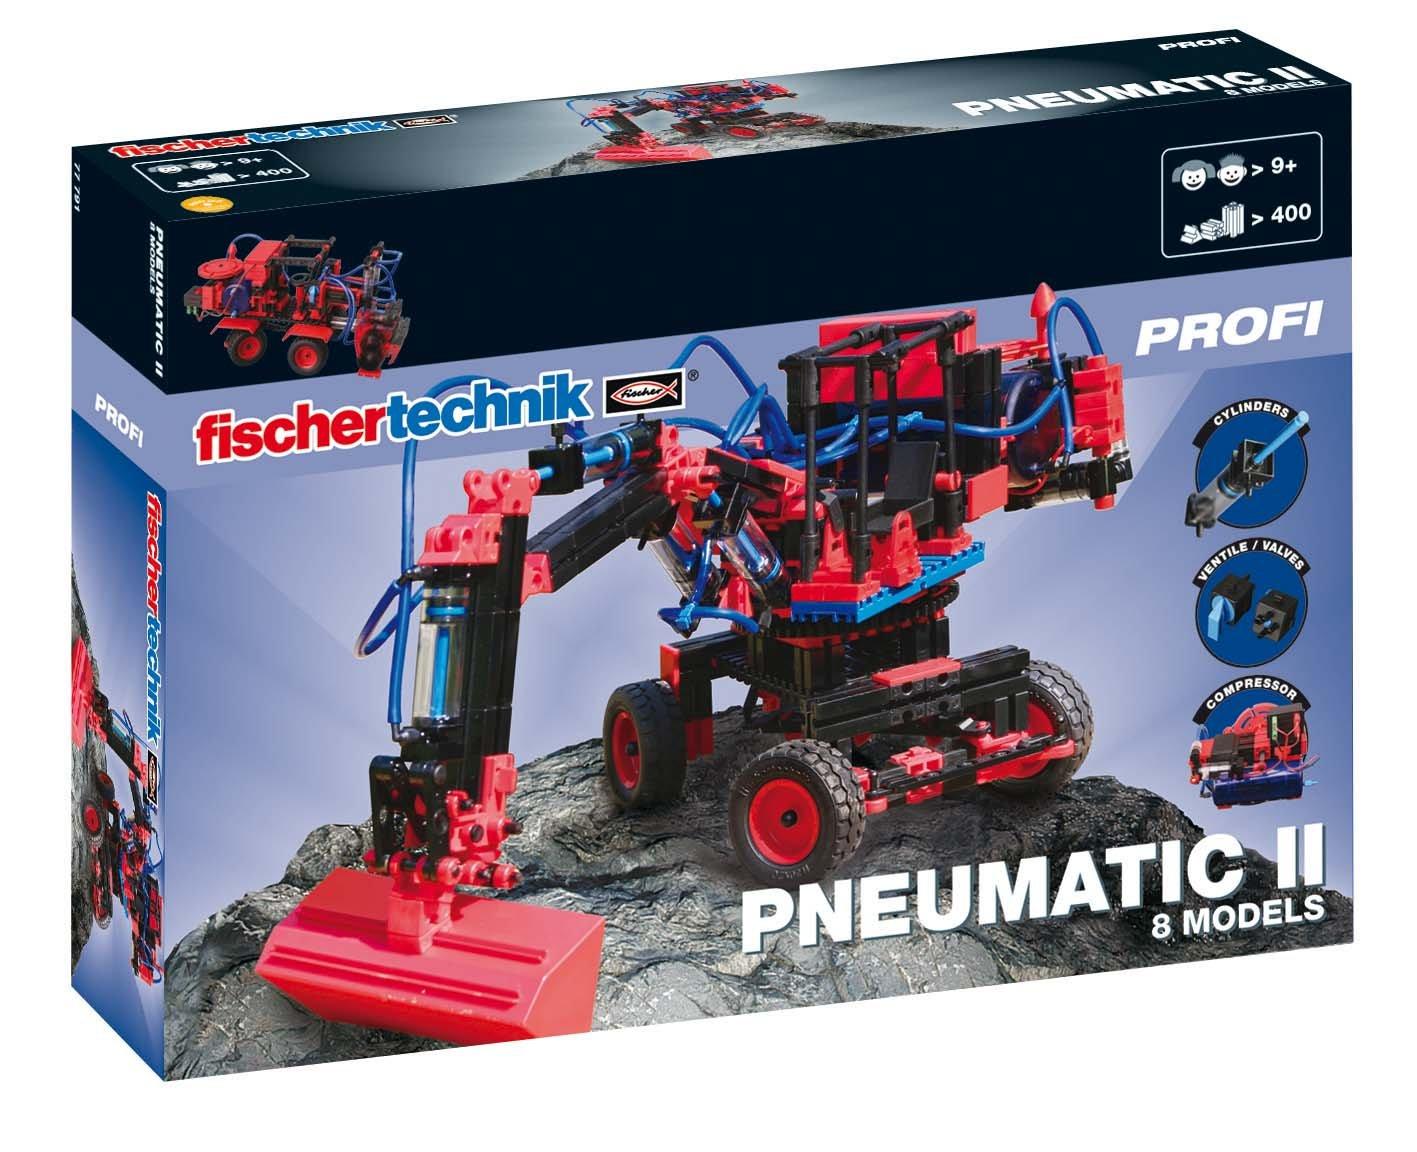 Fischertechnik Fischertechnik Fischertechnik 77791 - Profi Pneumatic II eb1e30